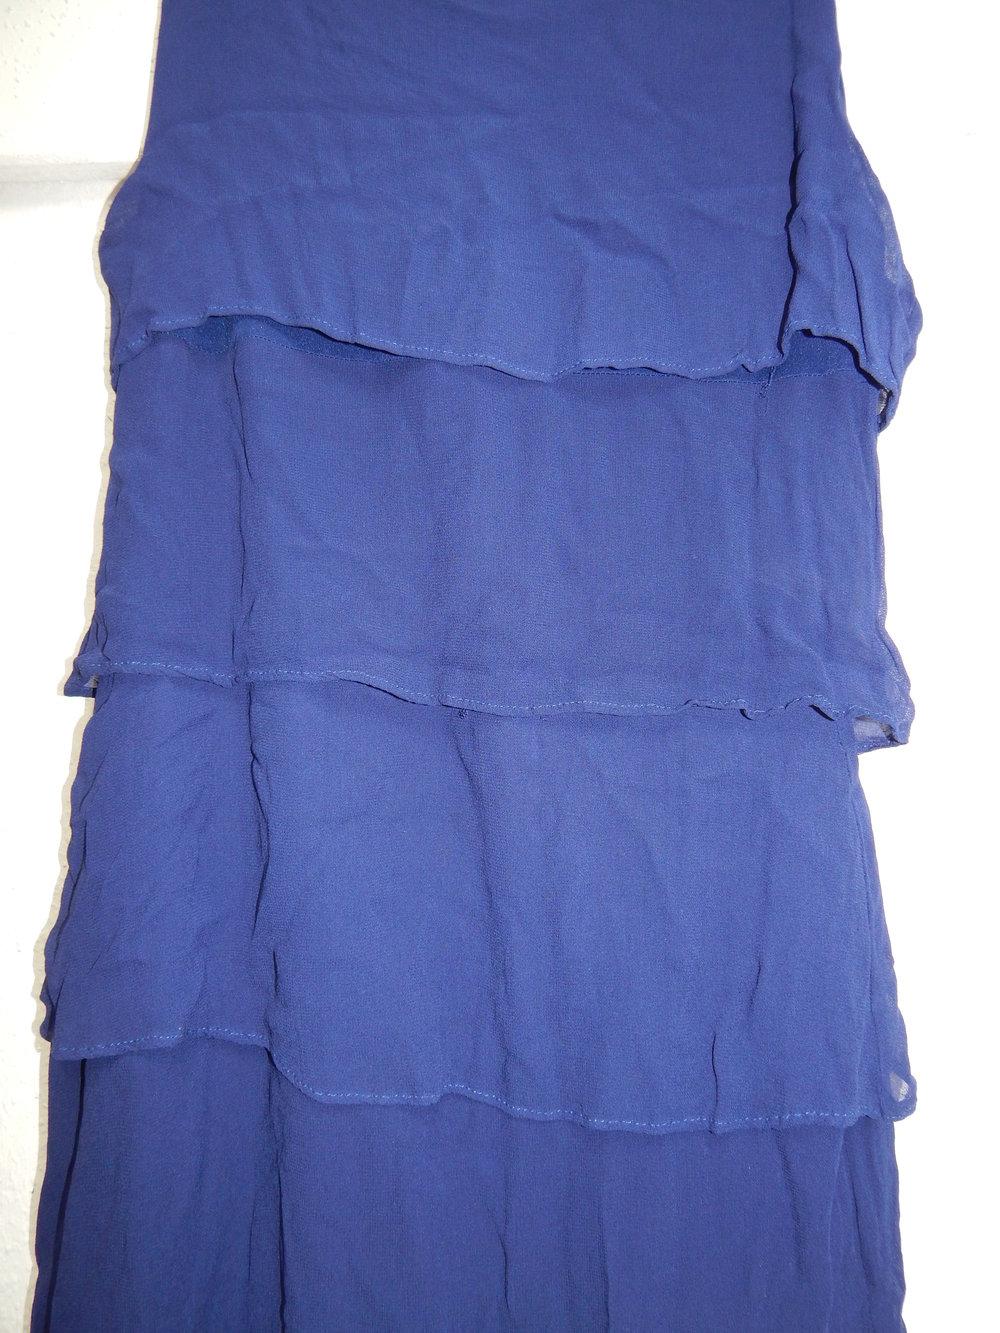 royalblaues, blaues Volantkleid, Kleid, Volants, dunkelblau, Zara, L ...